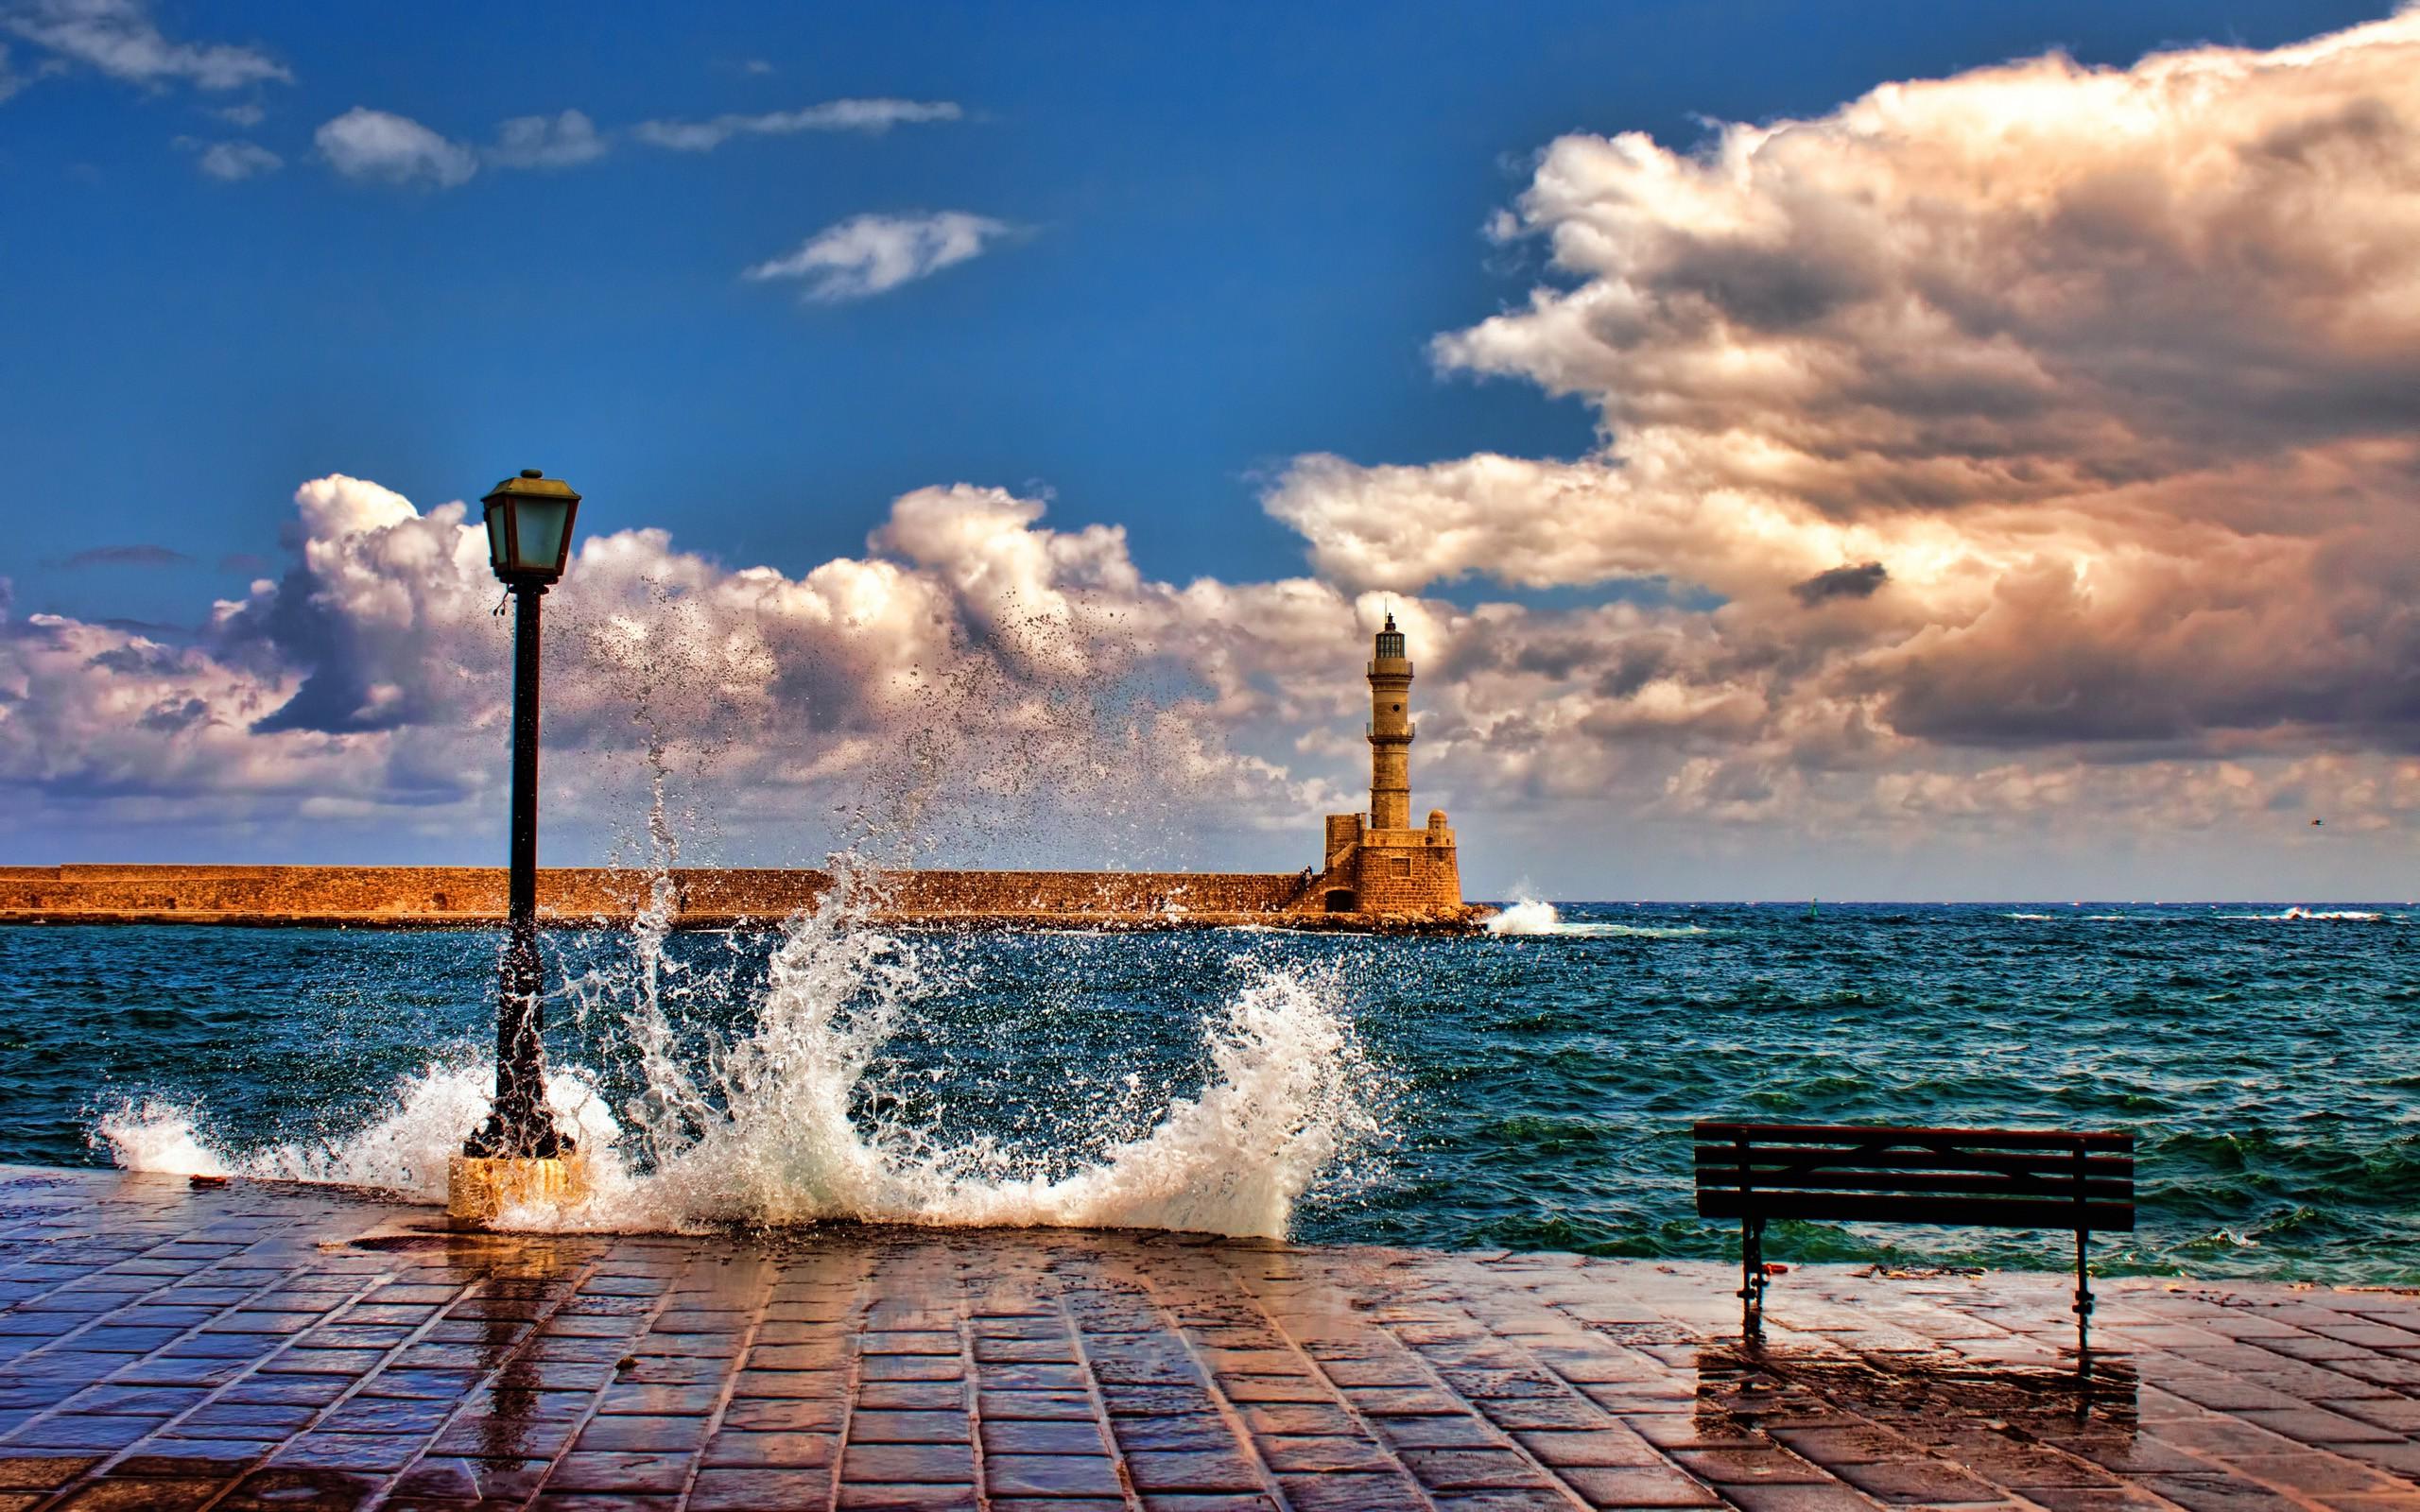 nature Architecture Landscape Clouds Horizon Crete Greece 2560x1600